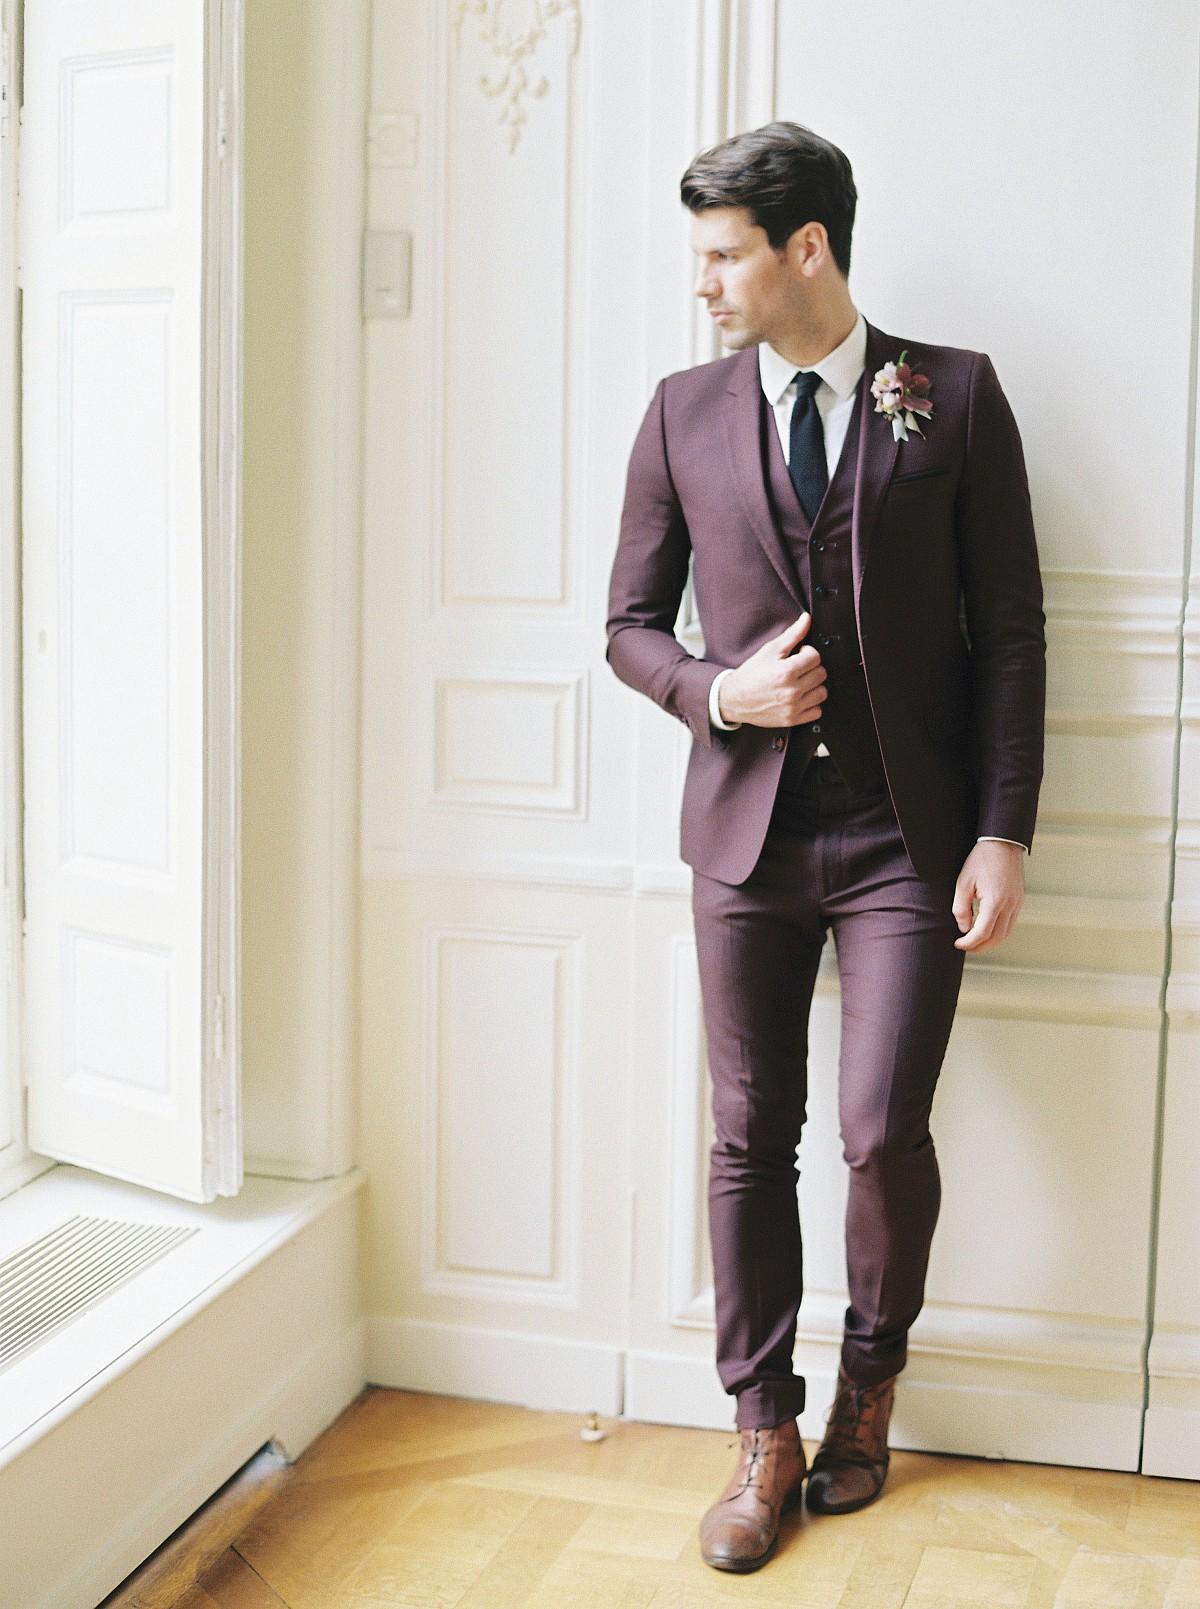 Faint blue, burgundy, and gold fall wedding inspiration in Paris